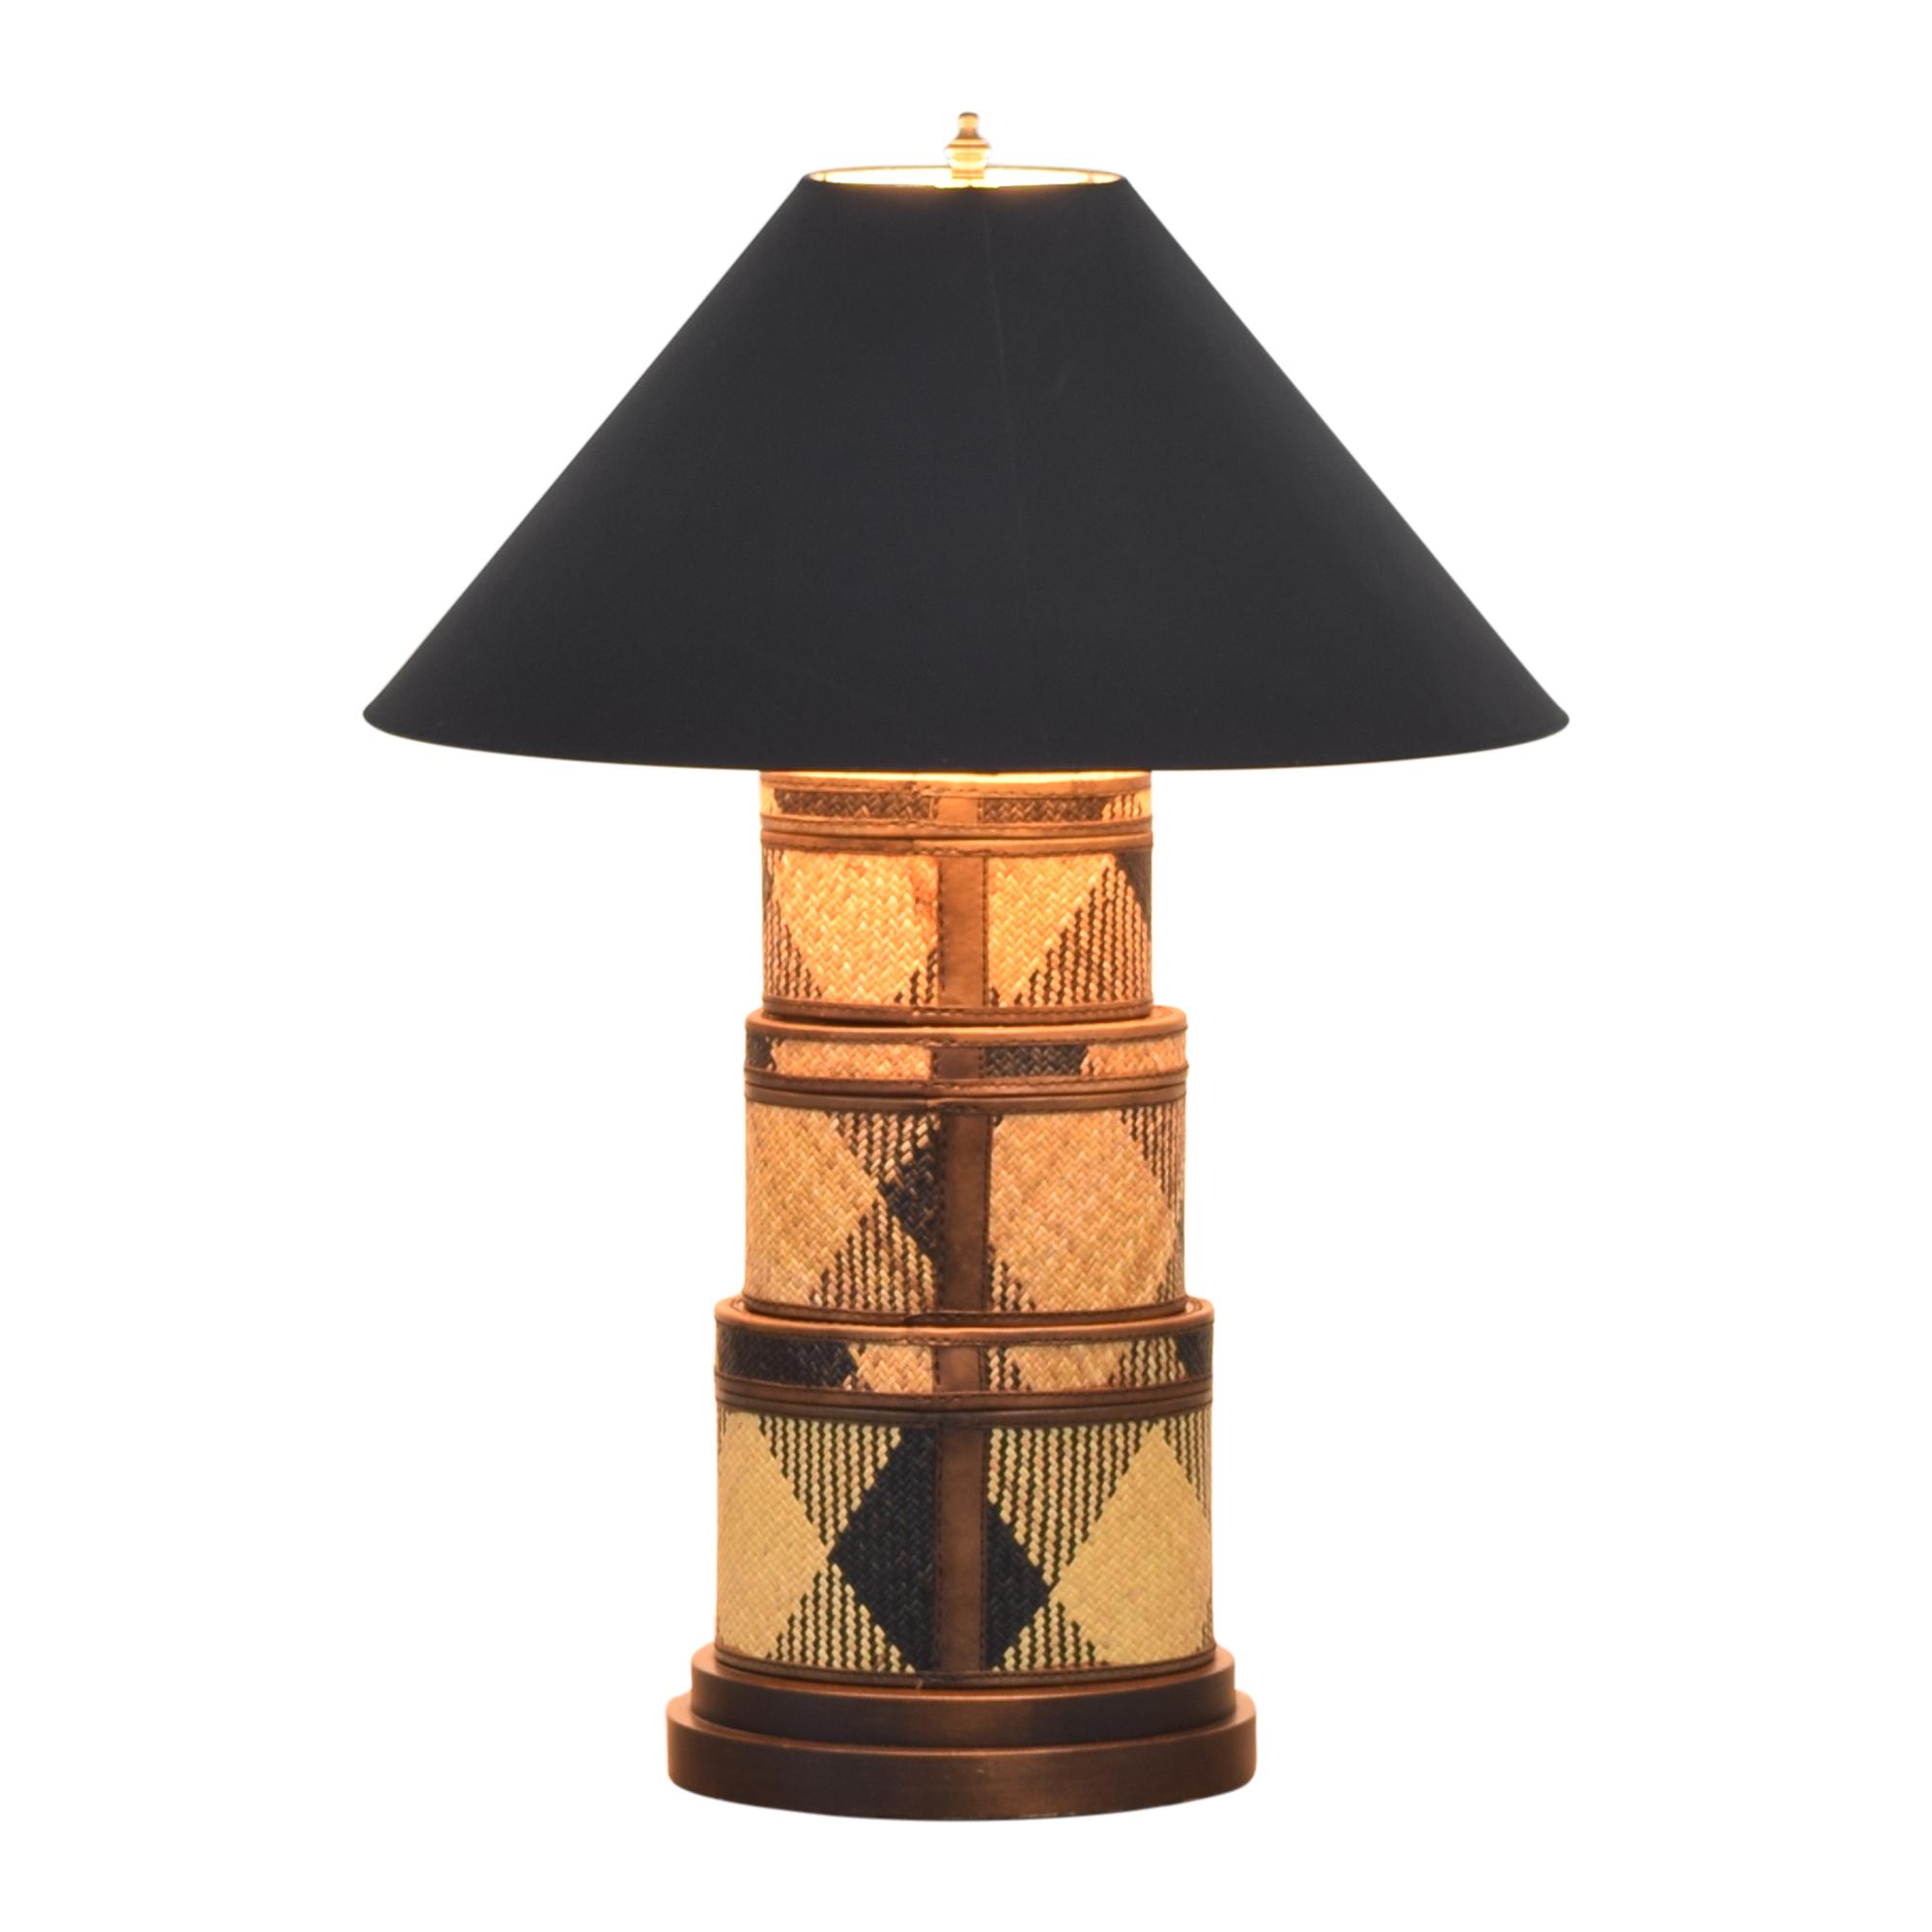 Frederick Cooper Frederick Cooper Rotating Basket Base Table Lamp used